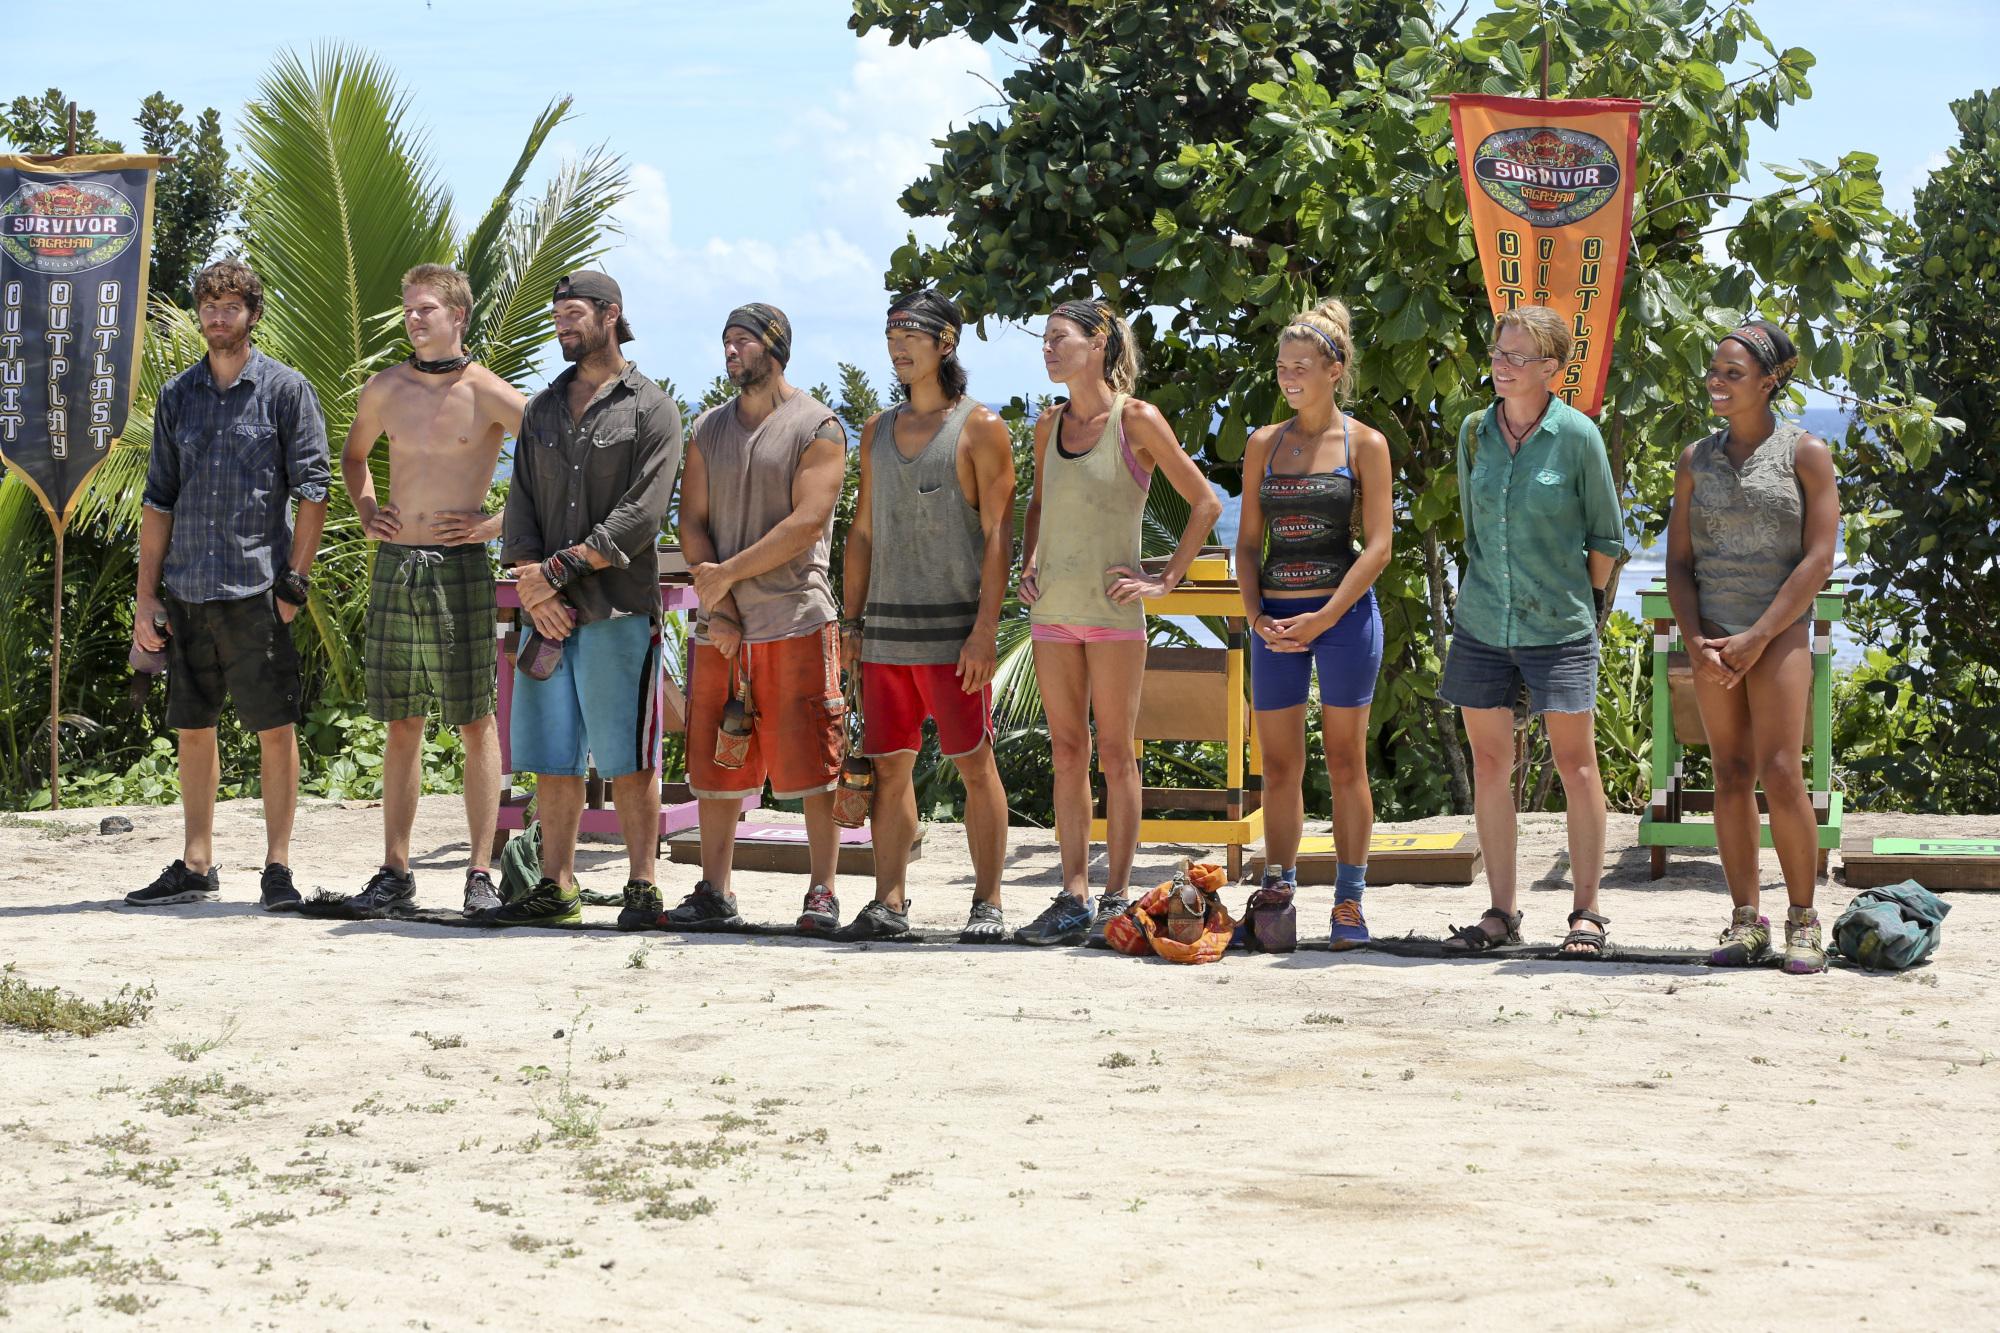 Solarrion Tribe in Season 28 Episode 8